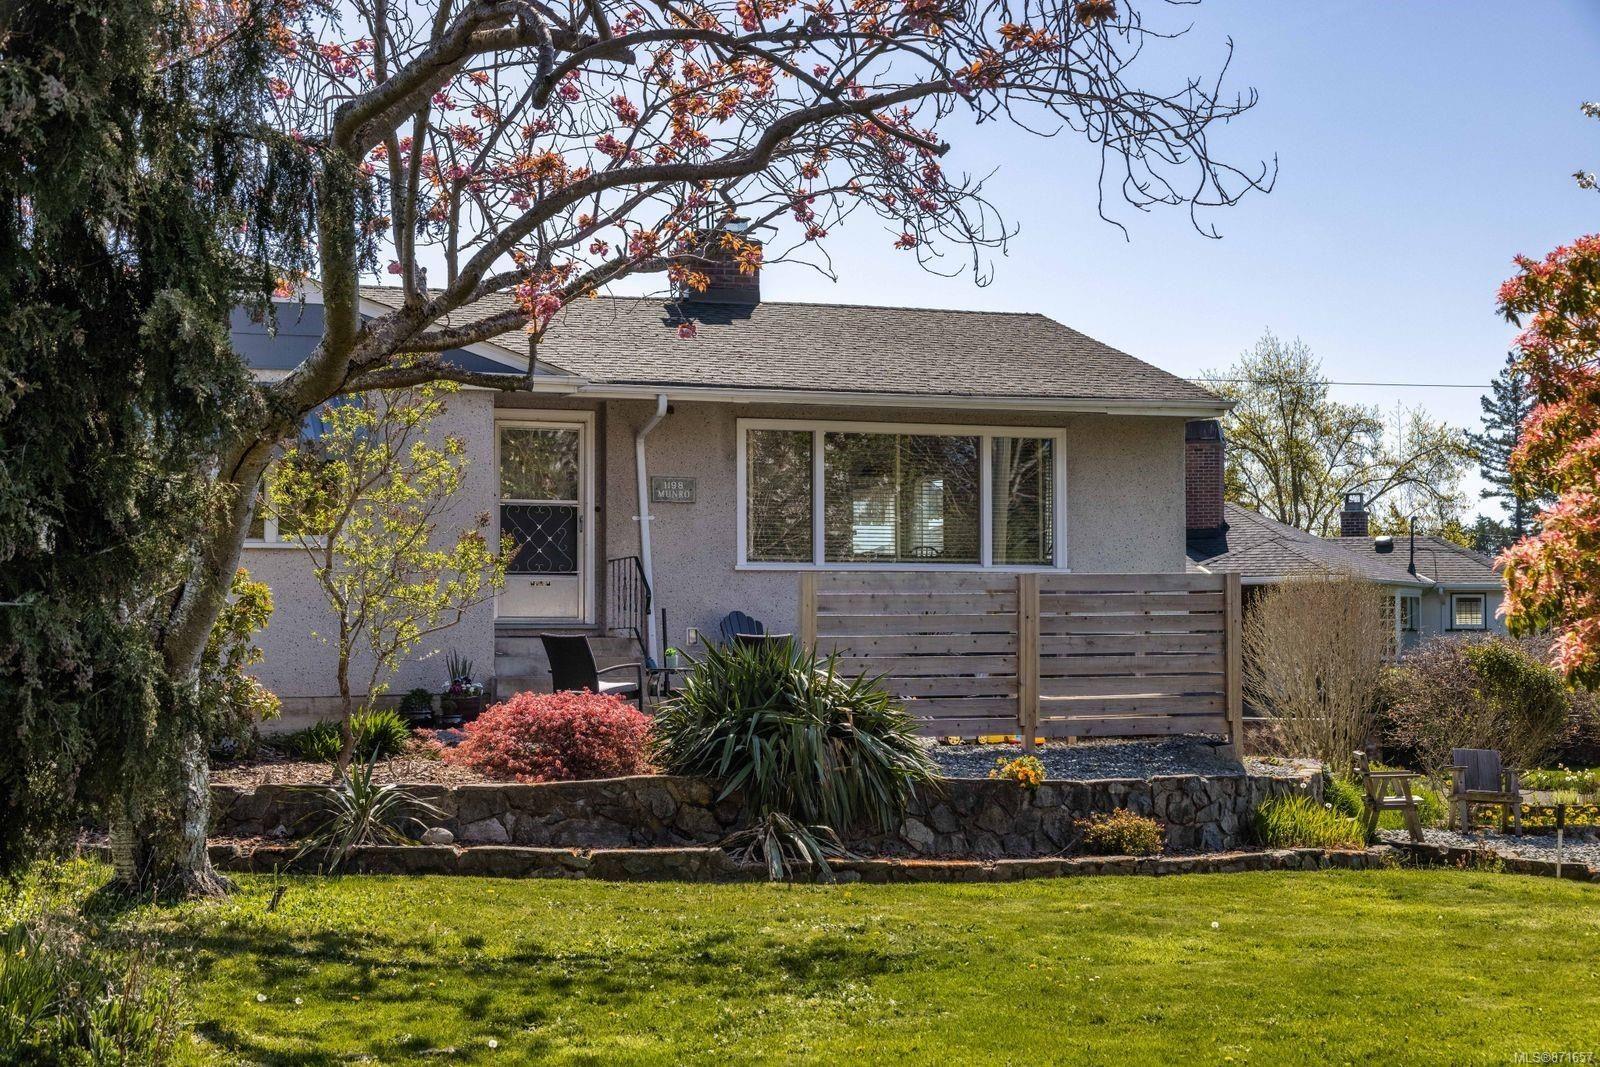 Main Photo: 1198 Munro St in : Es Saxe Point House for sale (Esquimalt)  : MLS®# 871657